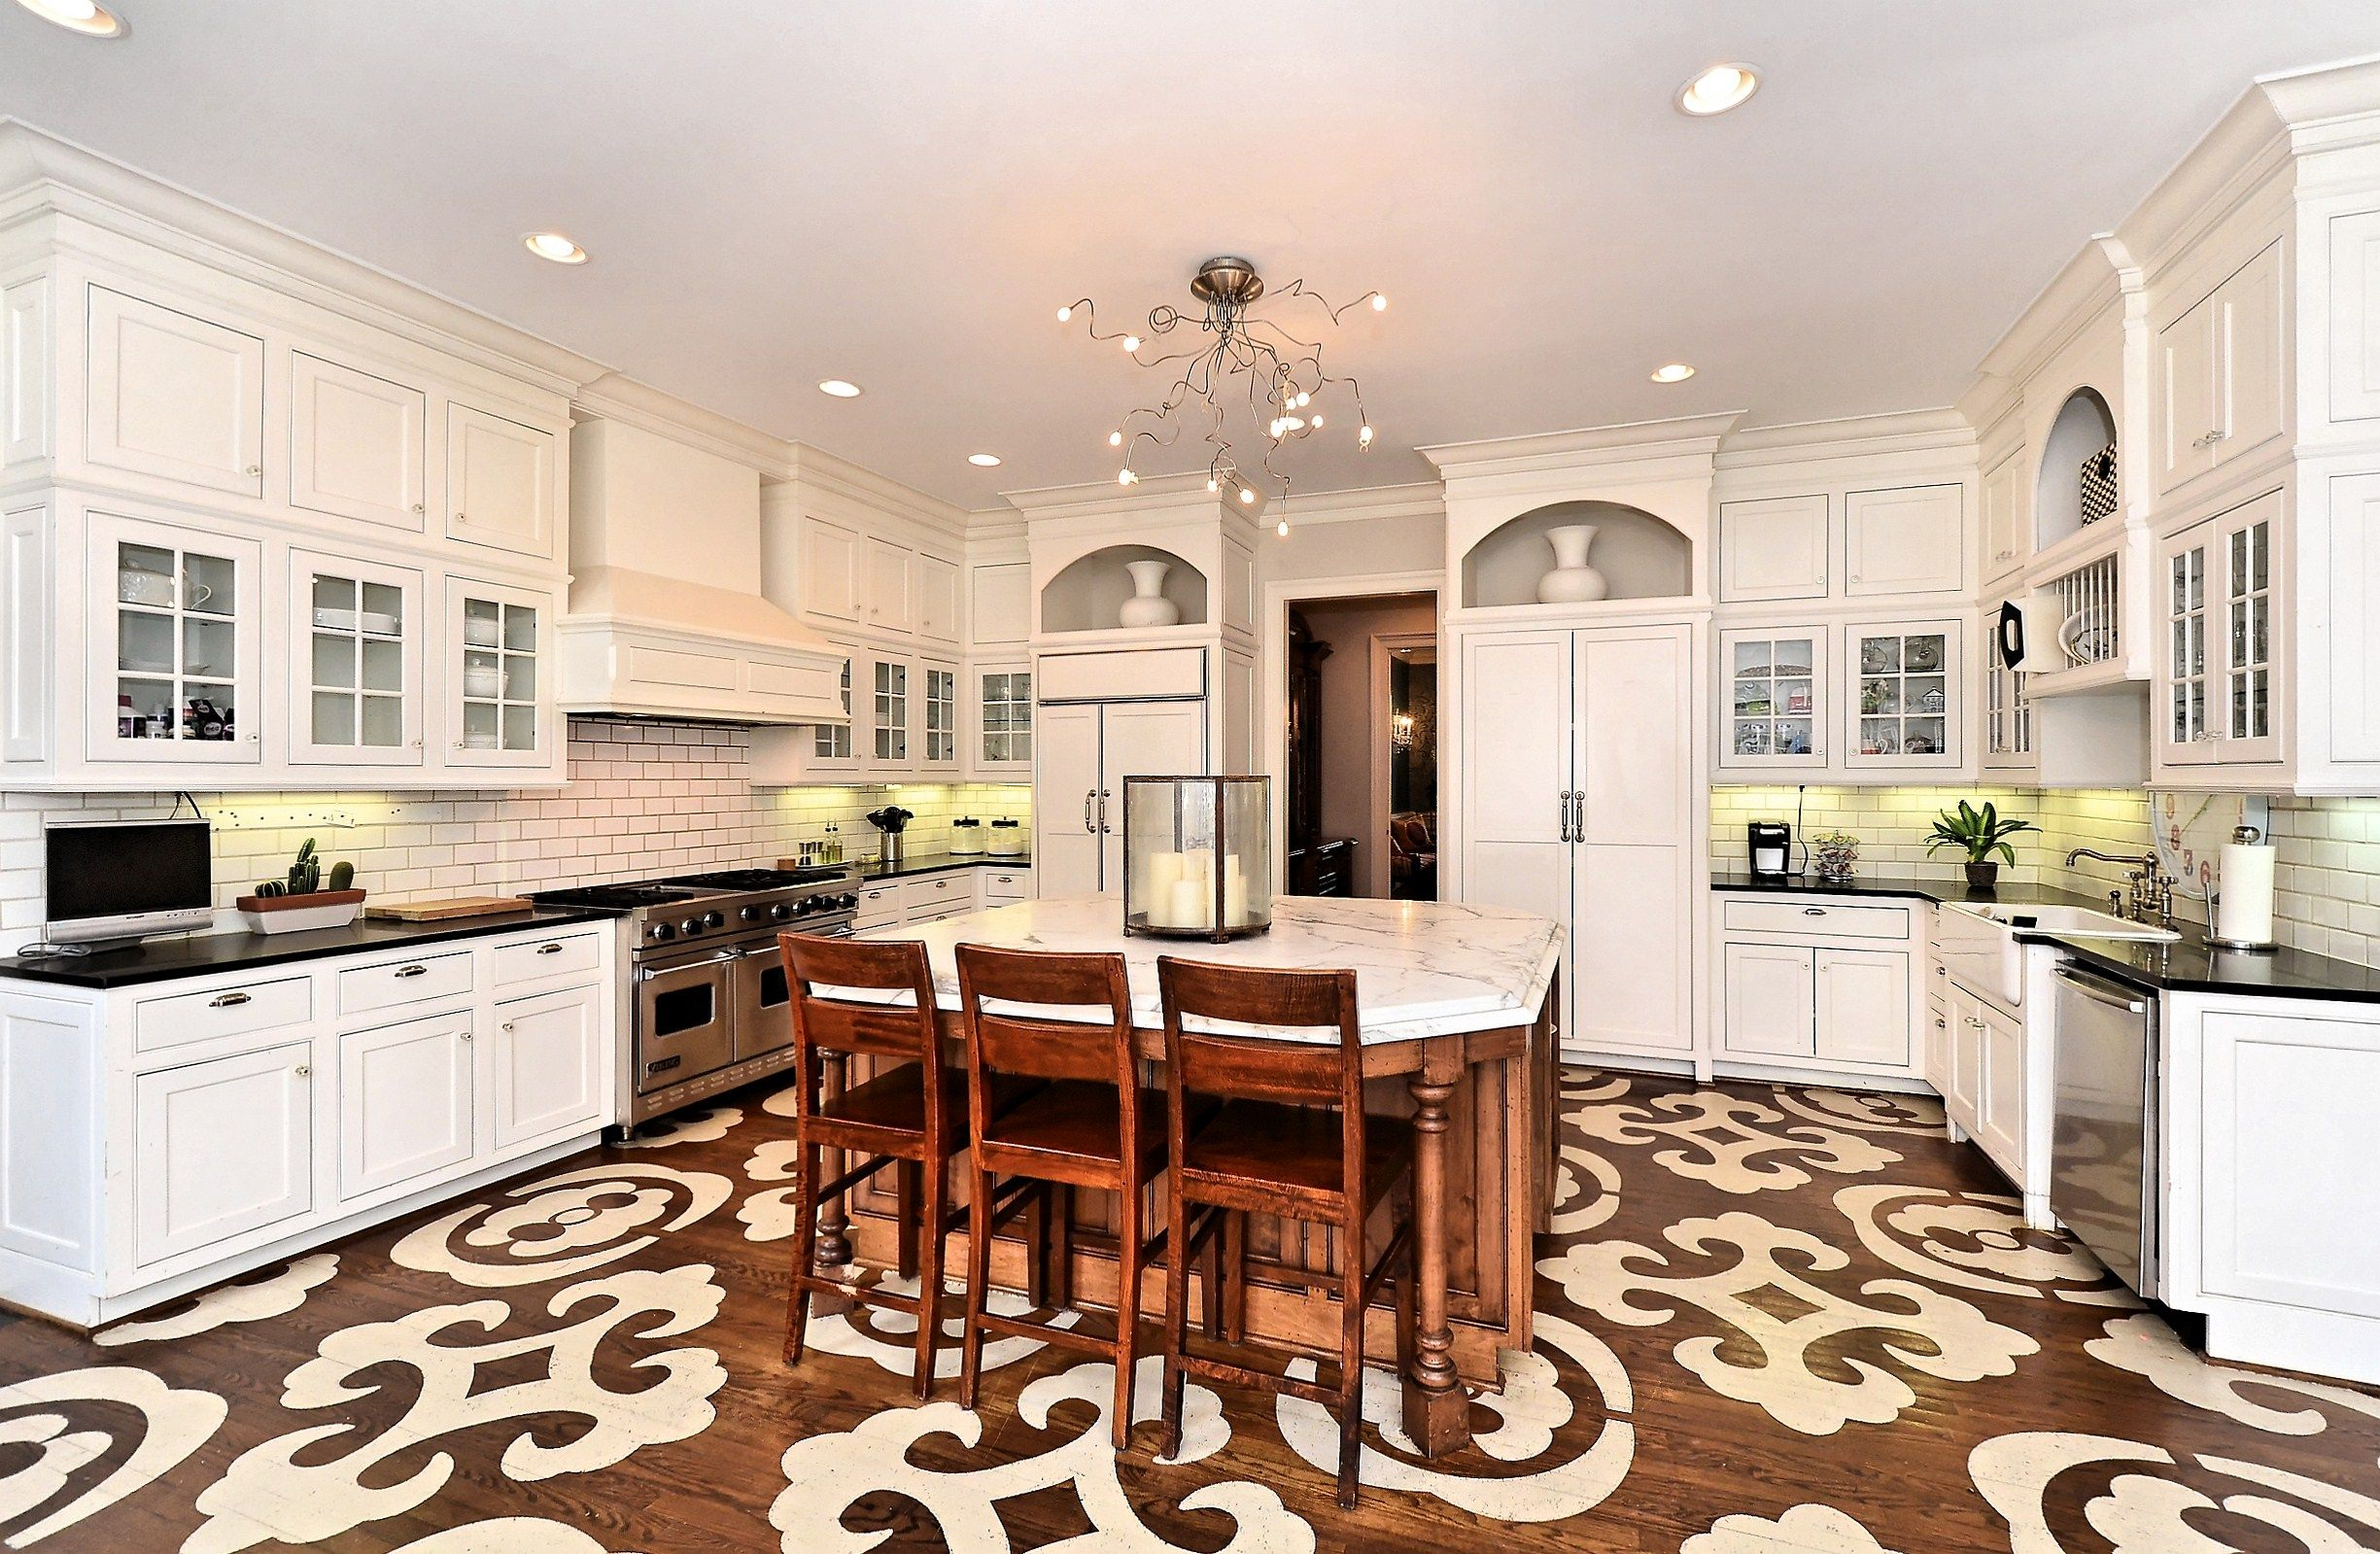 Kitchen http://dickensmitchener.com/listings/details.aspx?mls=2141781=RES=+D3gtSdLQG4fQID8Qipqww #floors